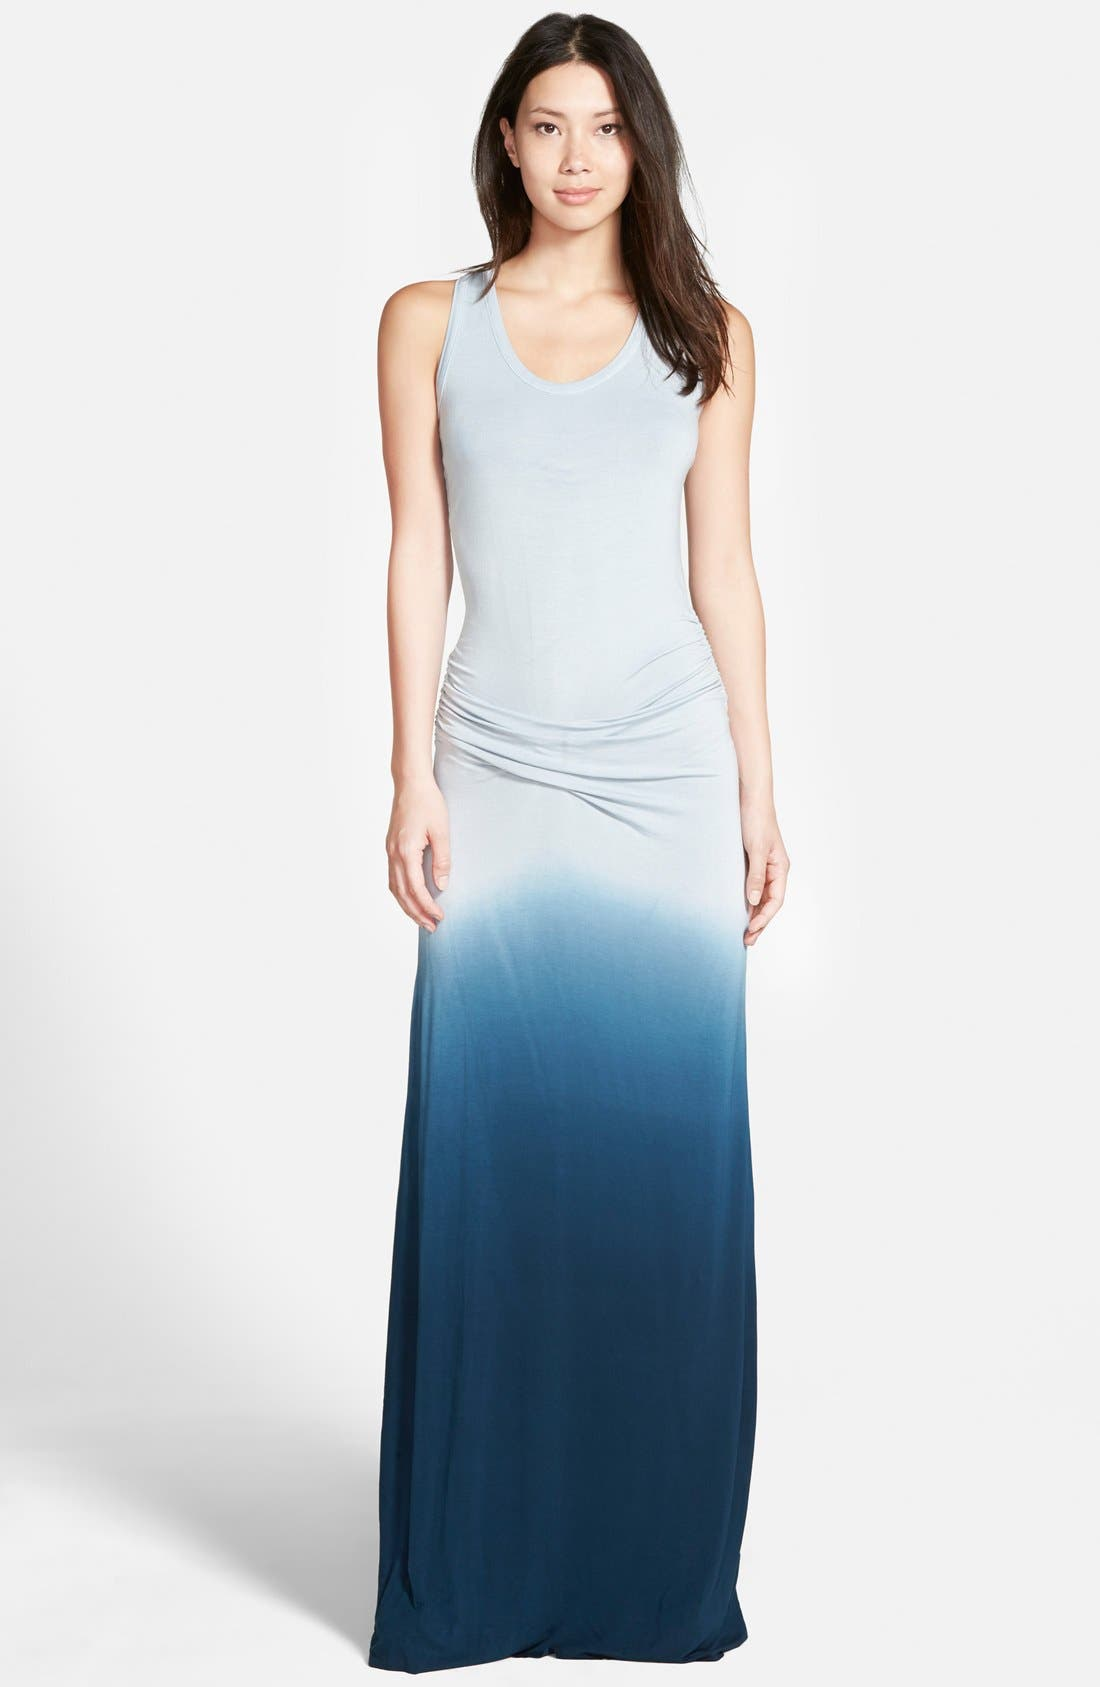 Alternate Image 1 Selected - Young, Fabulous & Broke 'Hamptons' Maxi Tank Dress